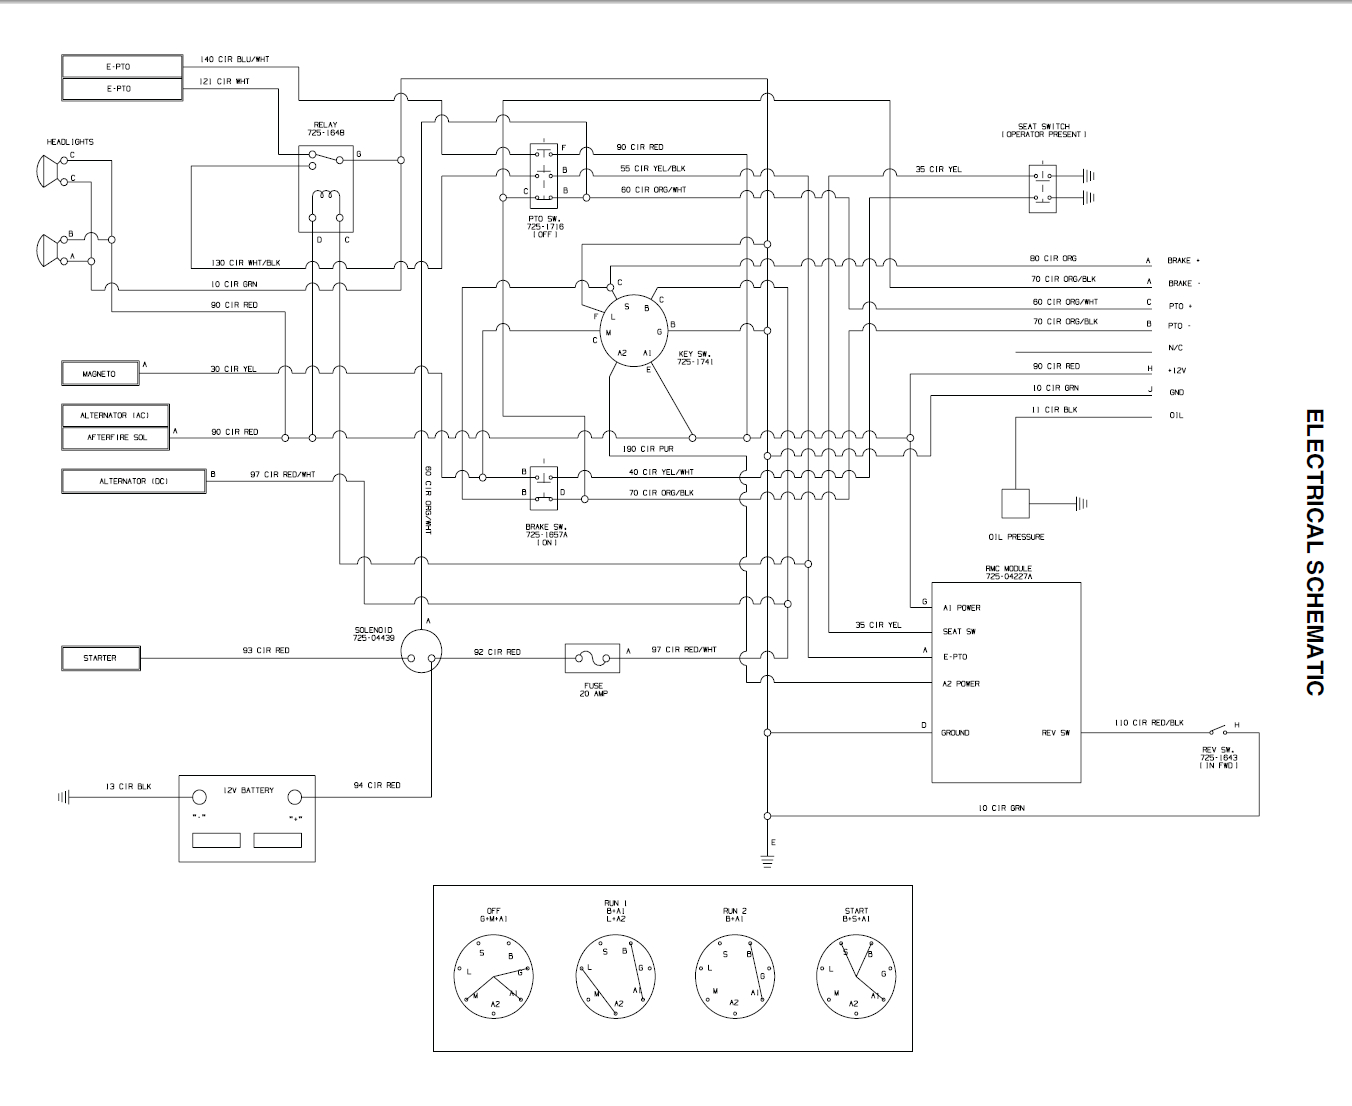 hight resolution of cub cadet 7272 schematic wiring diagram details cub cadet 7272 schematic wiring diagram cub cadet 7272